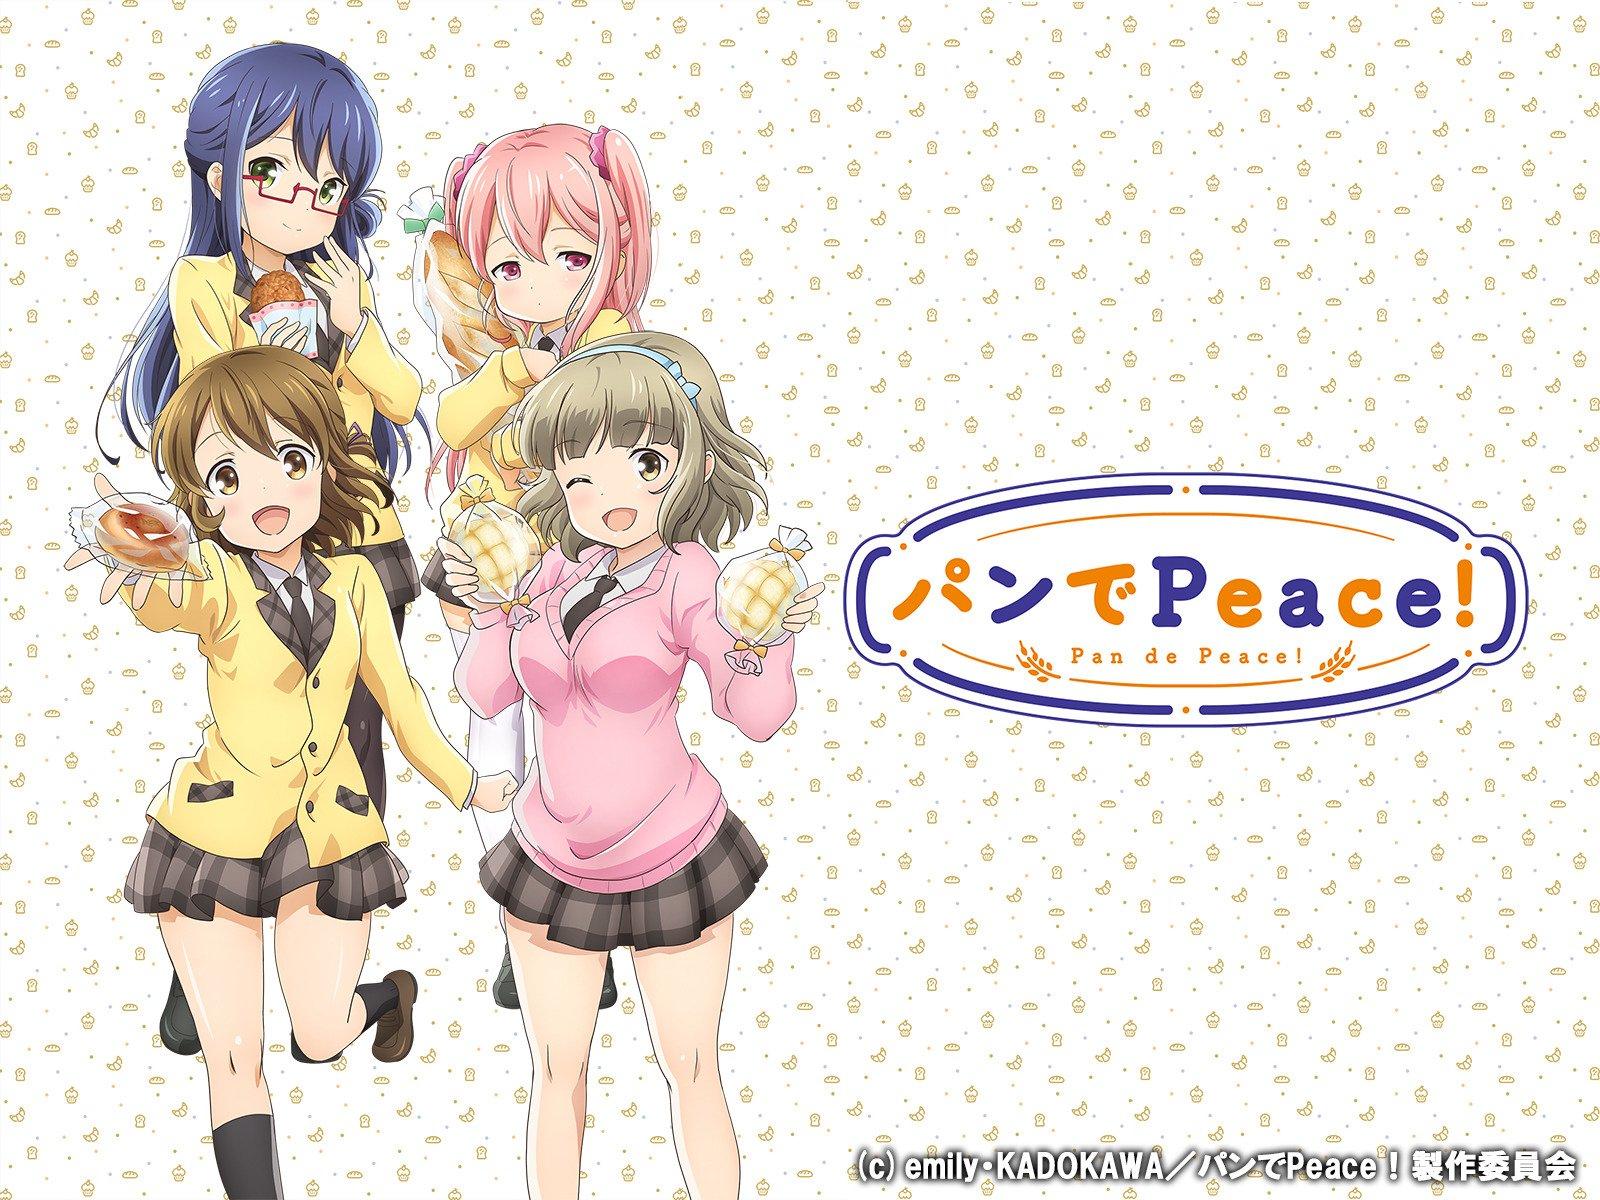 [Snow-Raws] 面包带来和平!/Pan de Peace!/パンでPeace!(BD 1920×1080 HEVC-YUV420P10 FLAC)